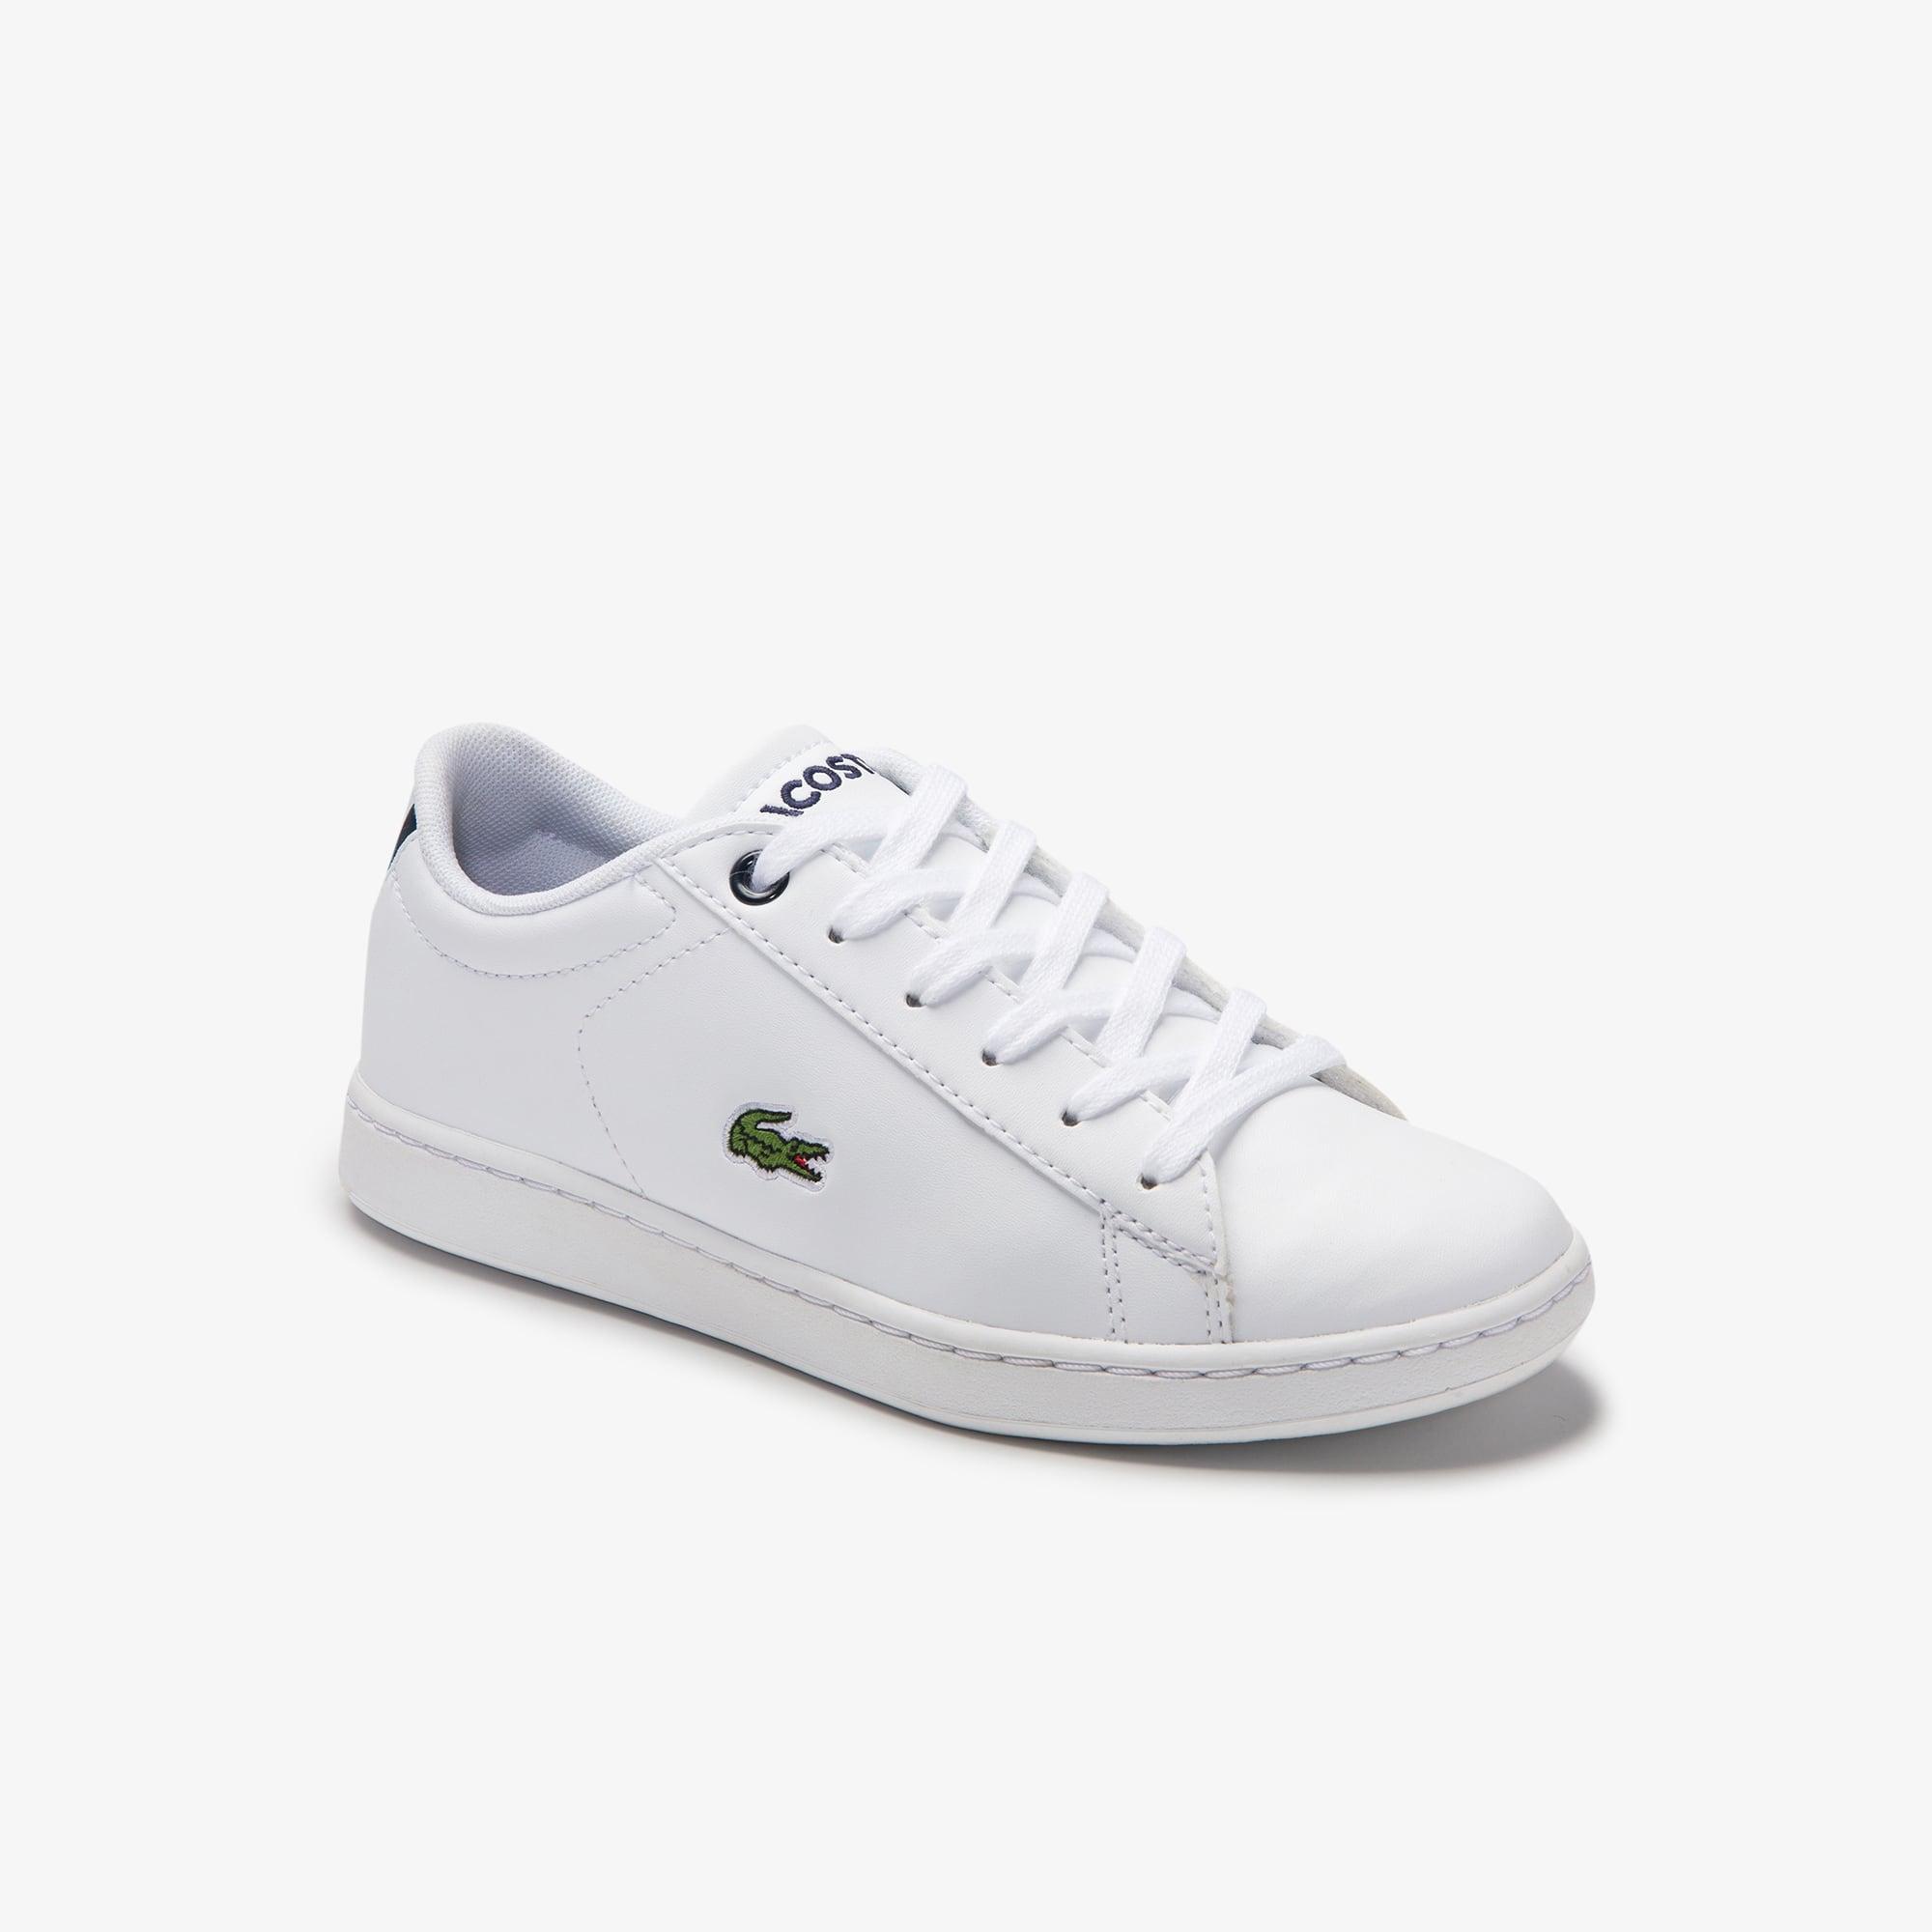 Lacoste Sneakers Carnaby Evo ton sur ton enfant en maille et synthétique Taille 34 Blanc/marine